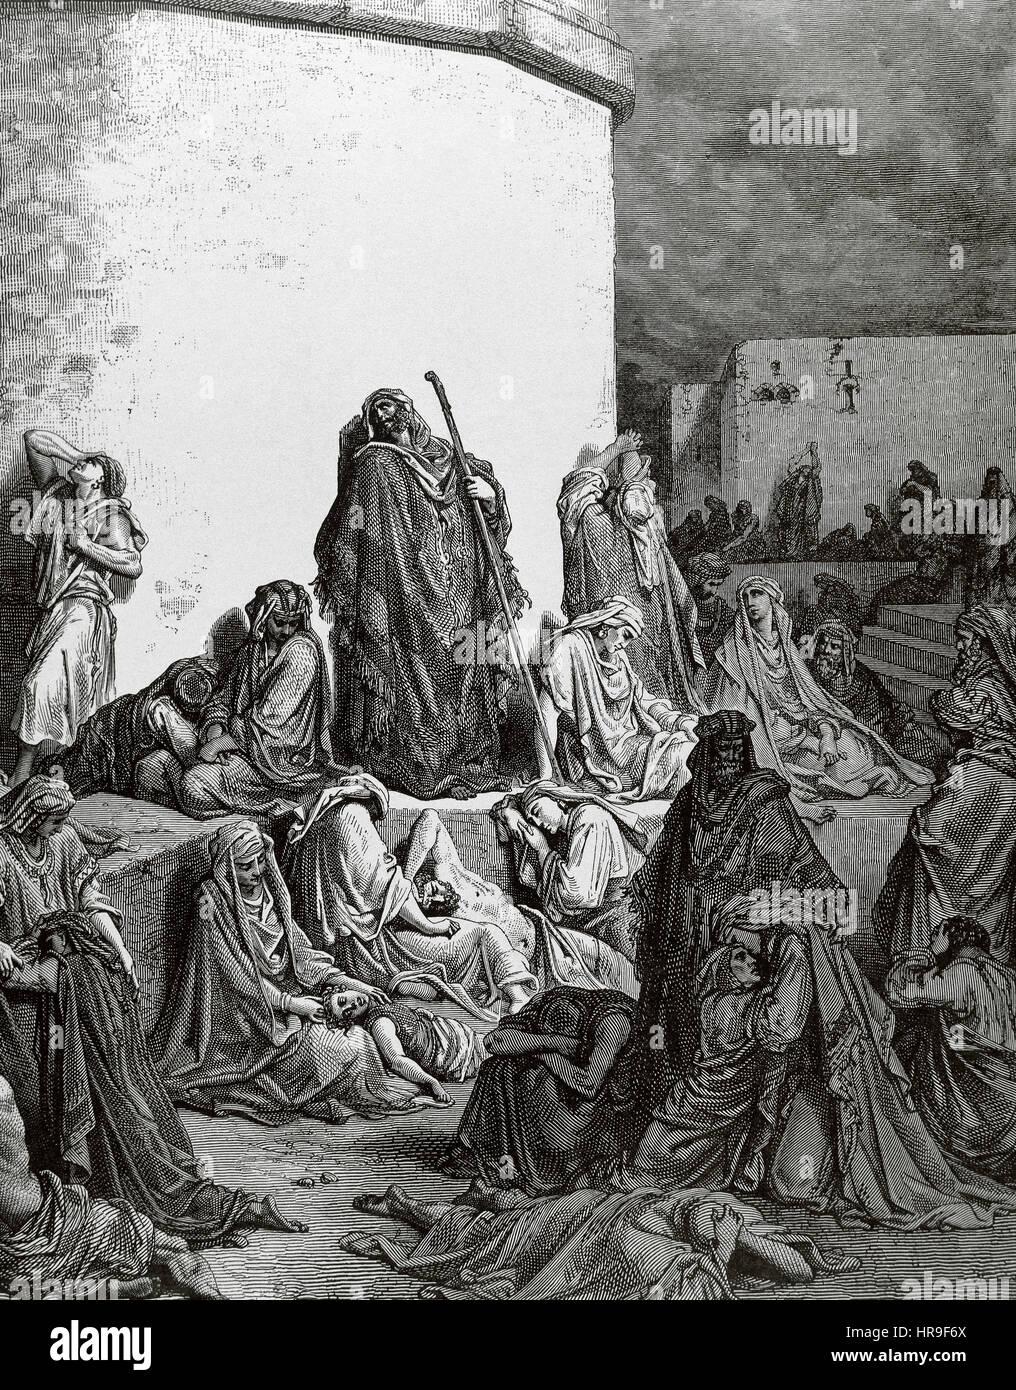 king nebuchadnezzar stock photos u0026 king nebuchadnezzar stock